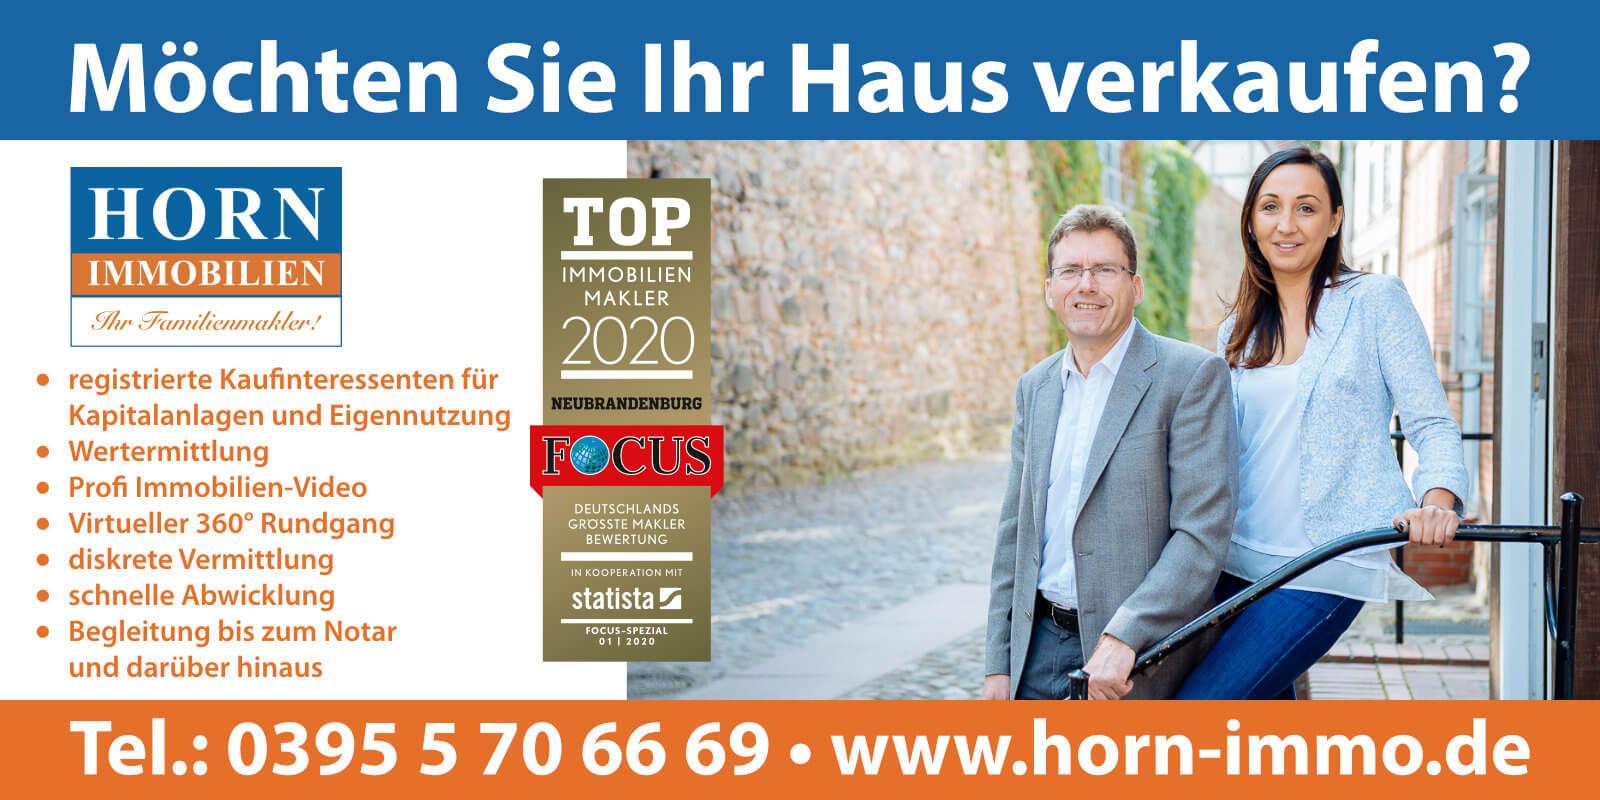 Horn Immobilien